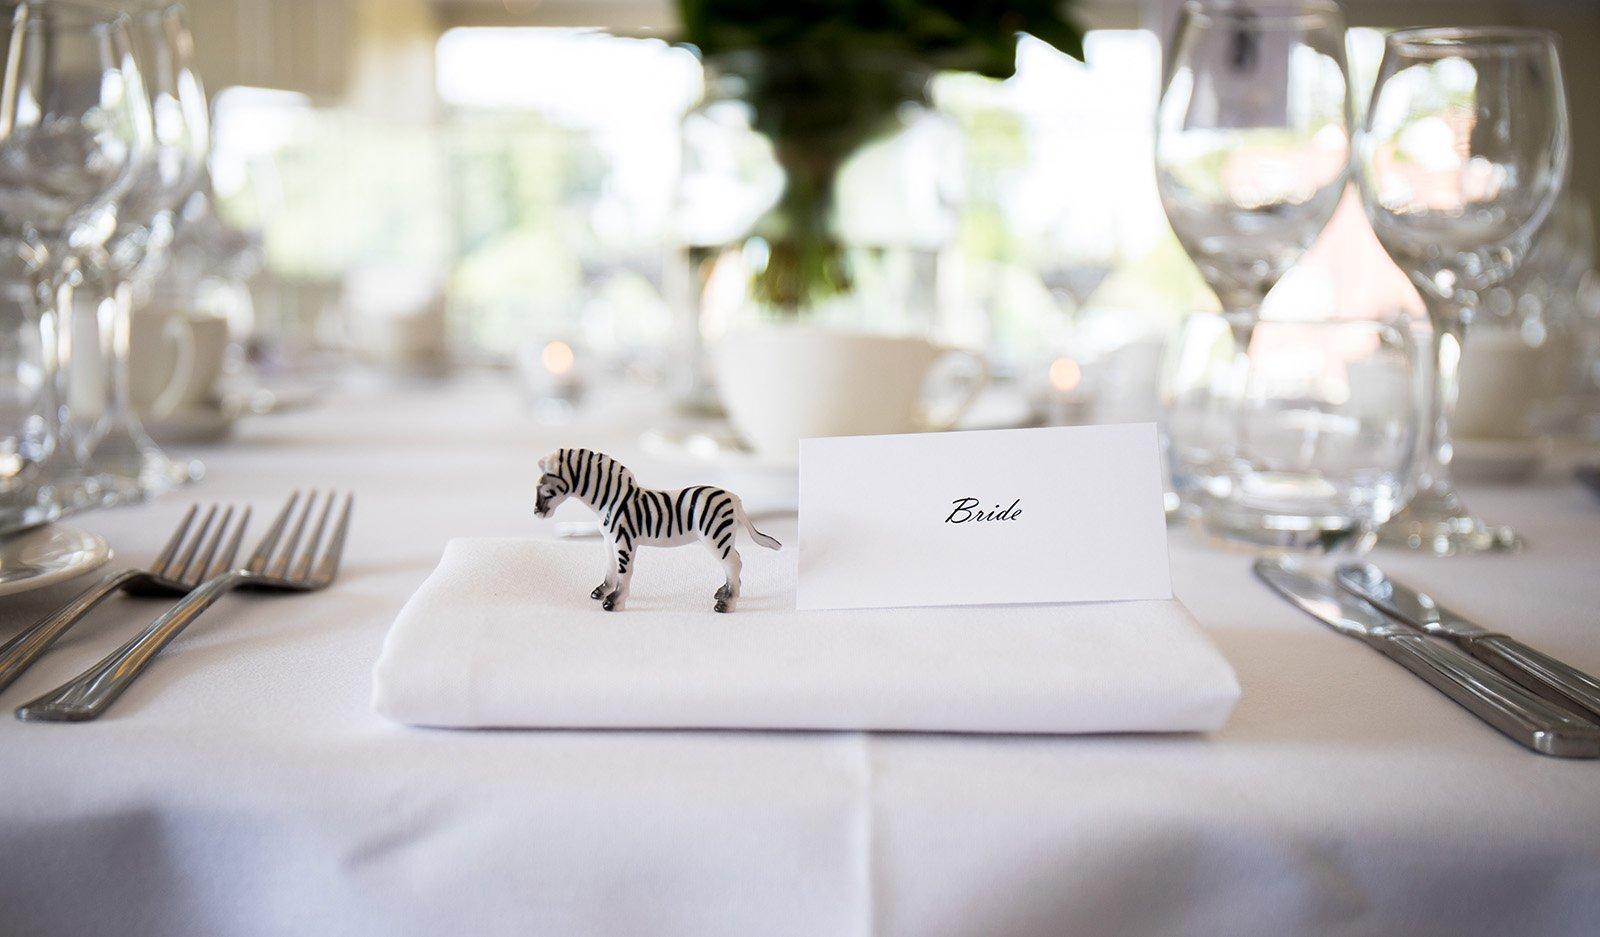 wedding table setting at London wedding venue